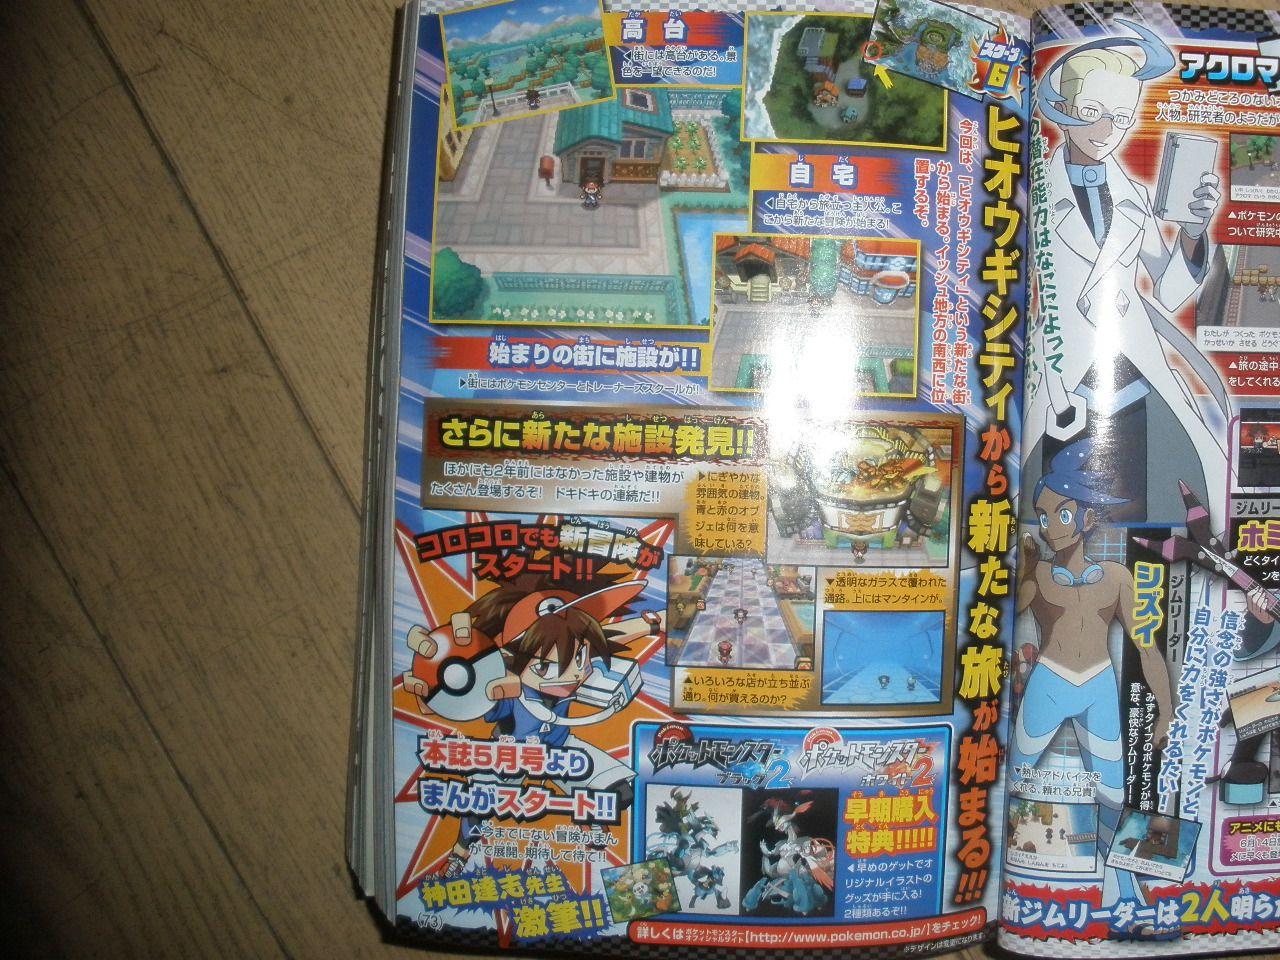 [Hilo Oficial] Pokemon Blanco/Negro 2 Corocoro_may12_ciudades